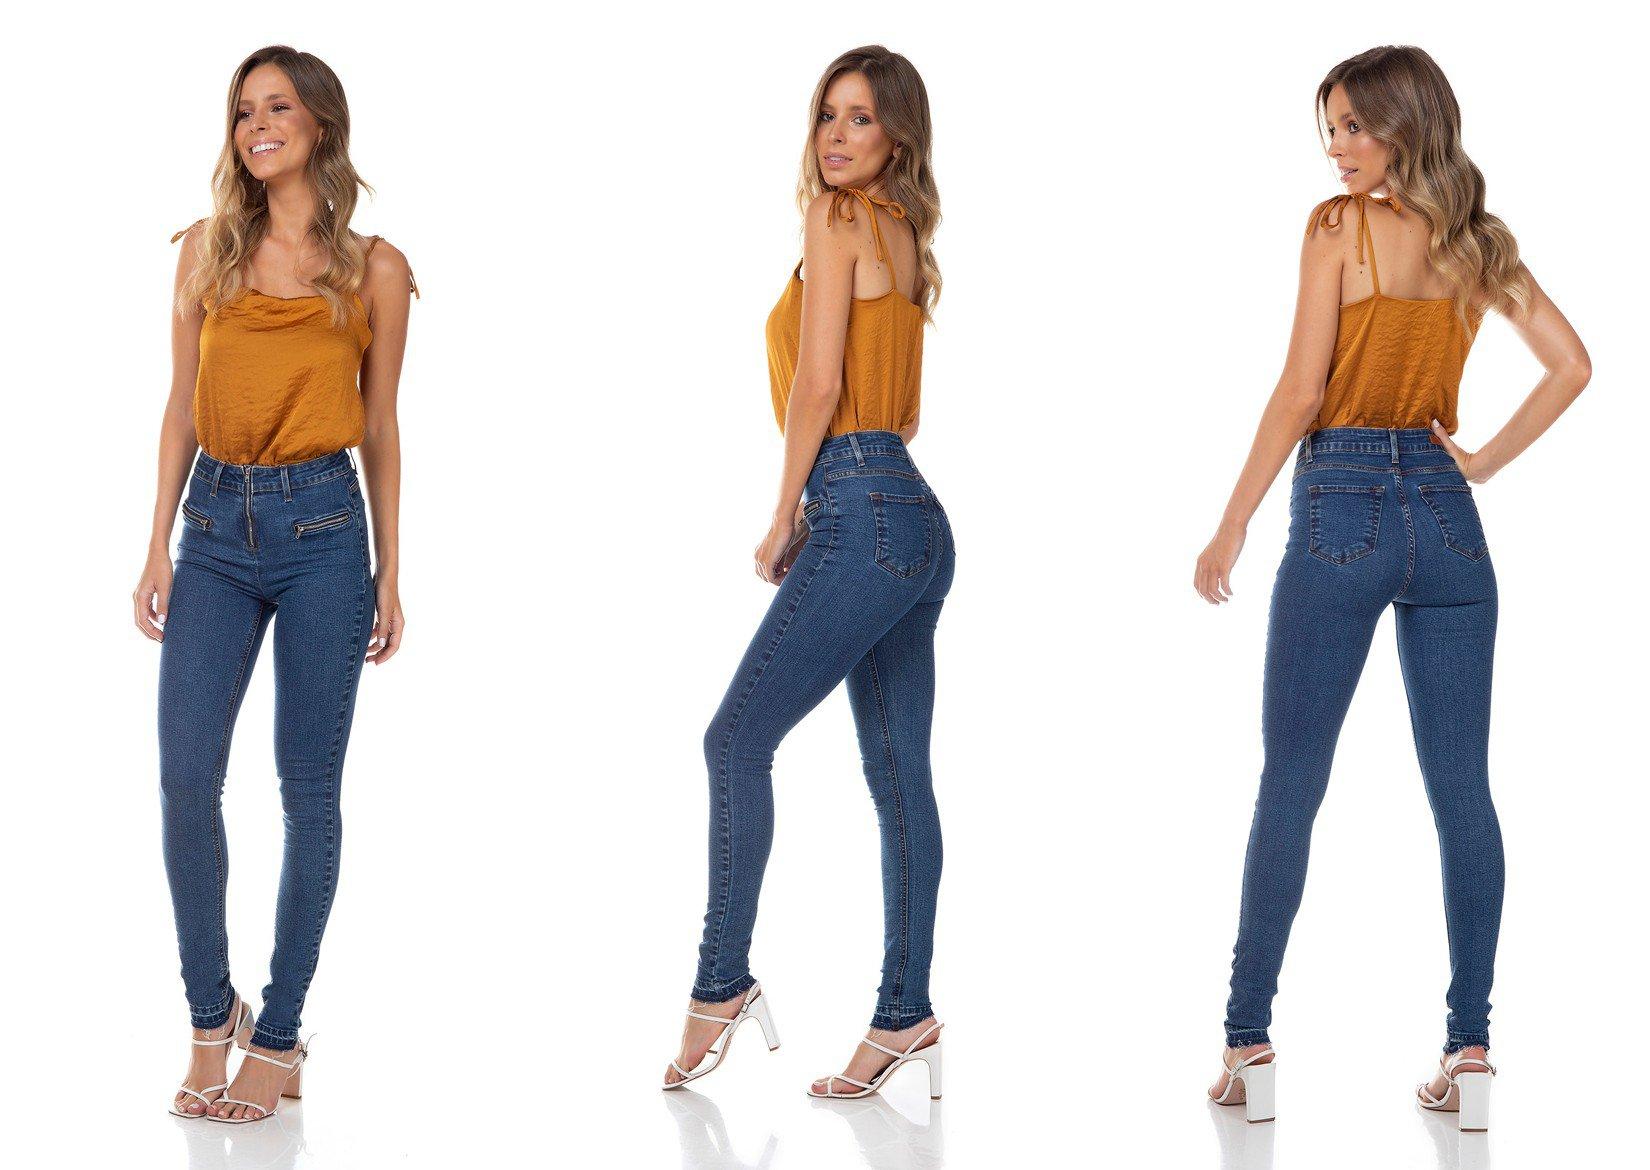 dz3344 calca jeans feminina skinny media fechamento com ziper denim zero tripla